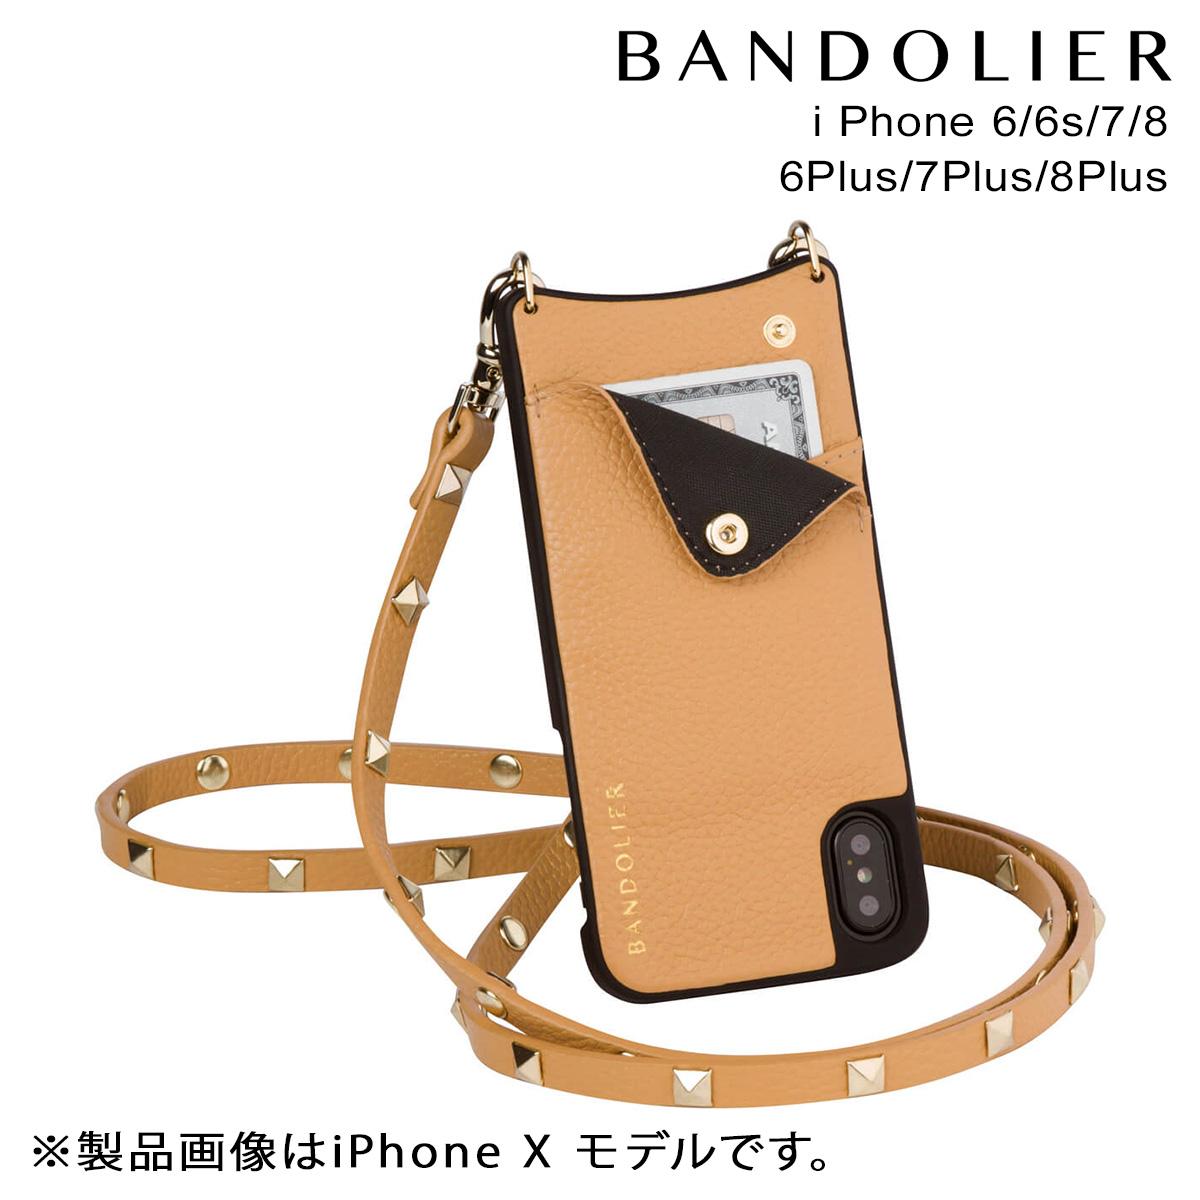 BANDOLIER iPhone8 iPhone7 7Plus 6s SARAH GOLDENROD バンドリヤー ケース スマホ アイフォン プラス メンズ レディース